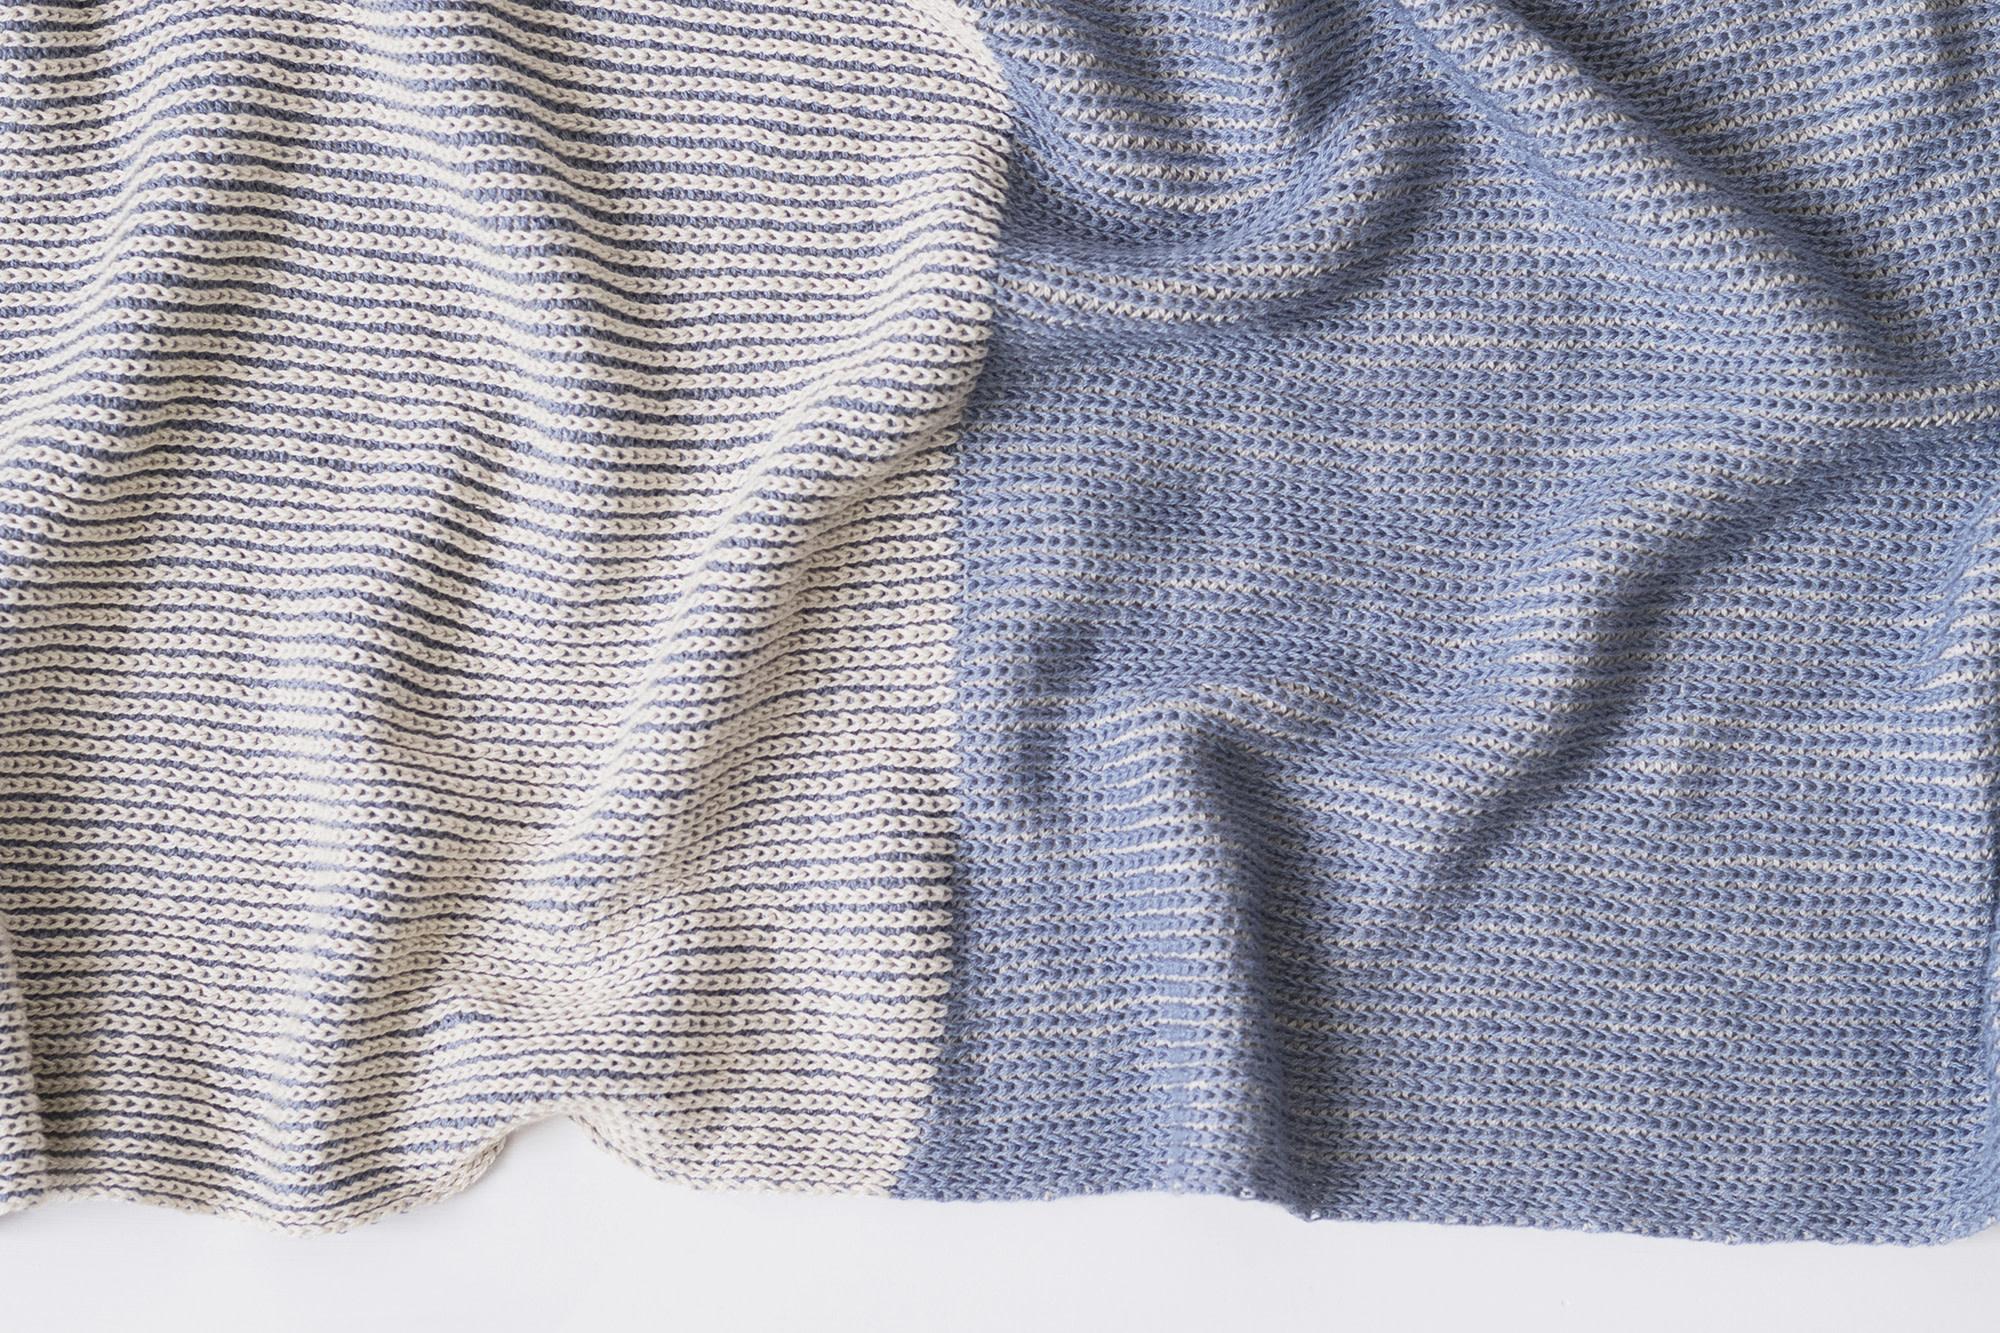 Echoview Fiber Mill Cotton Half + Half Scarf